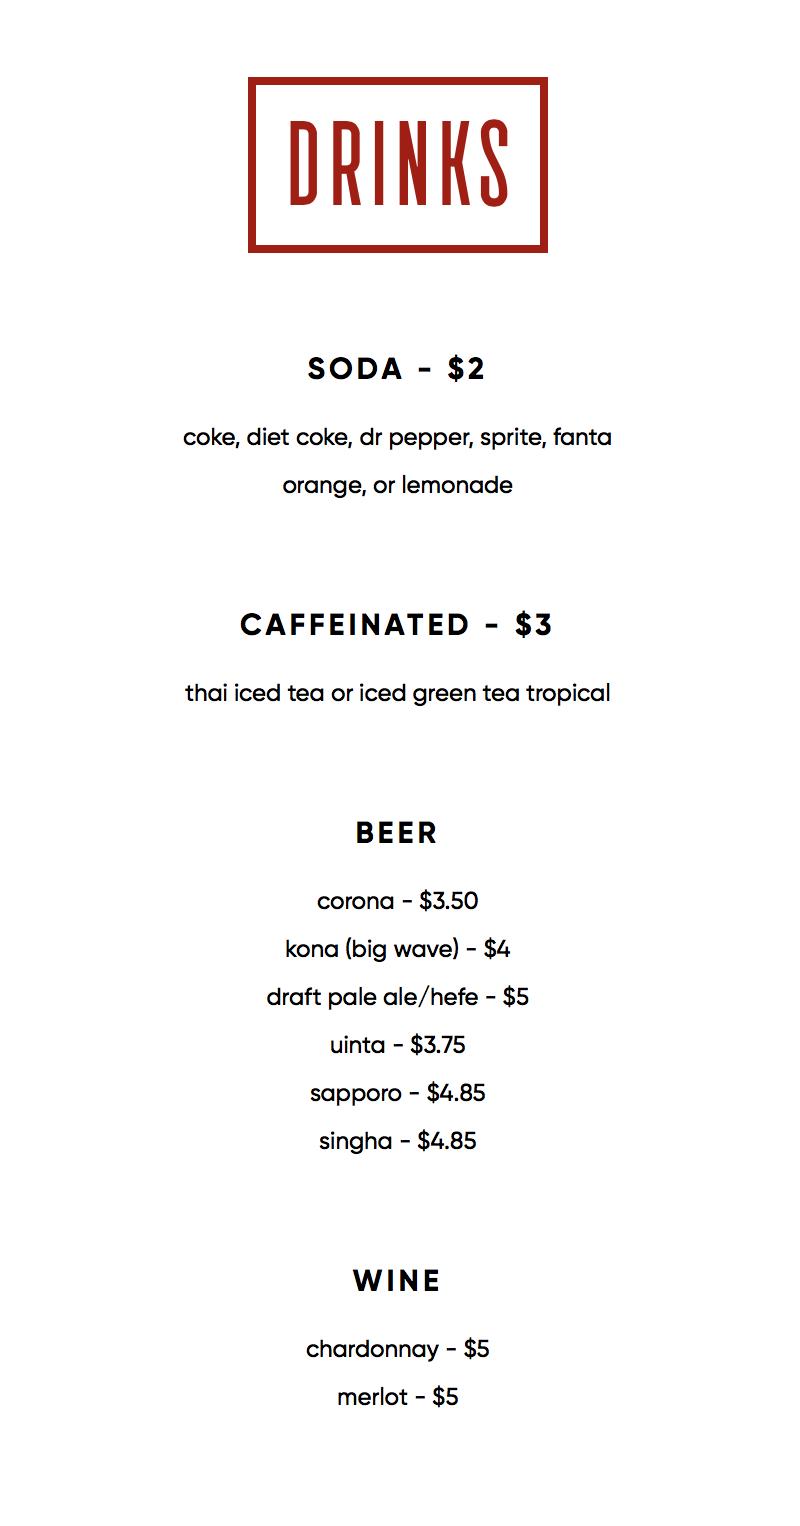 565 Firehouse menu - drinks